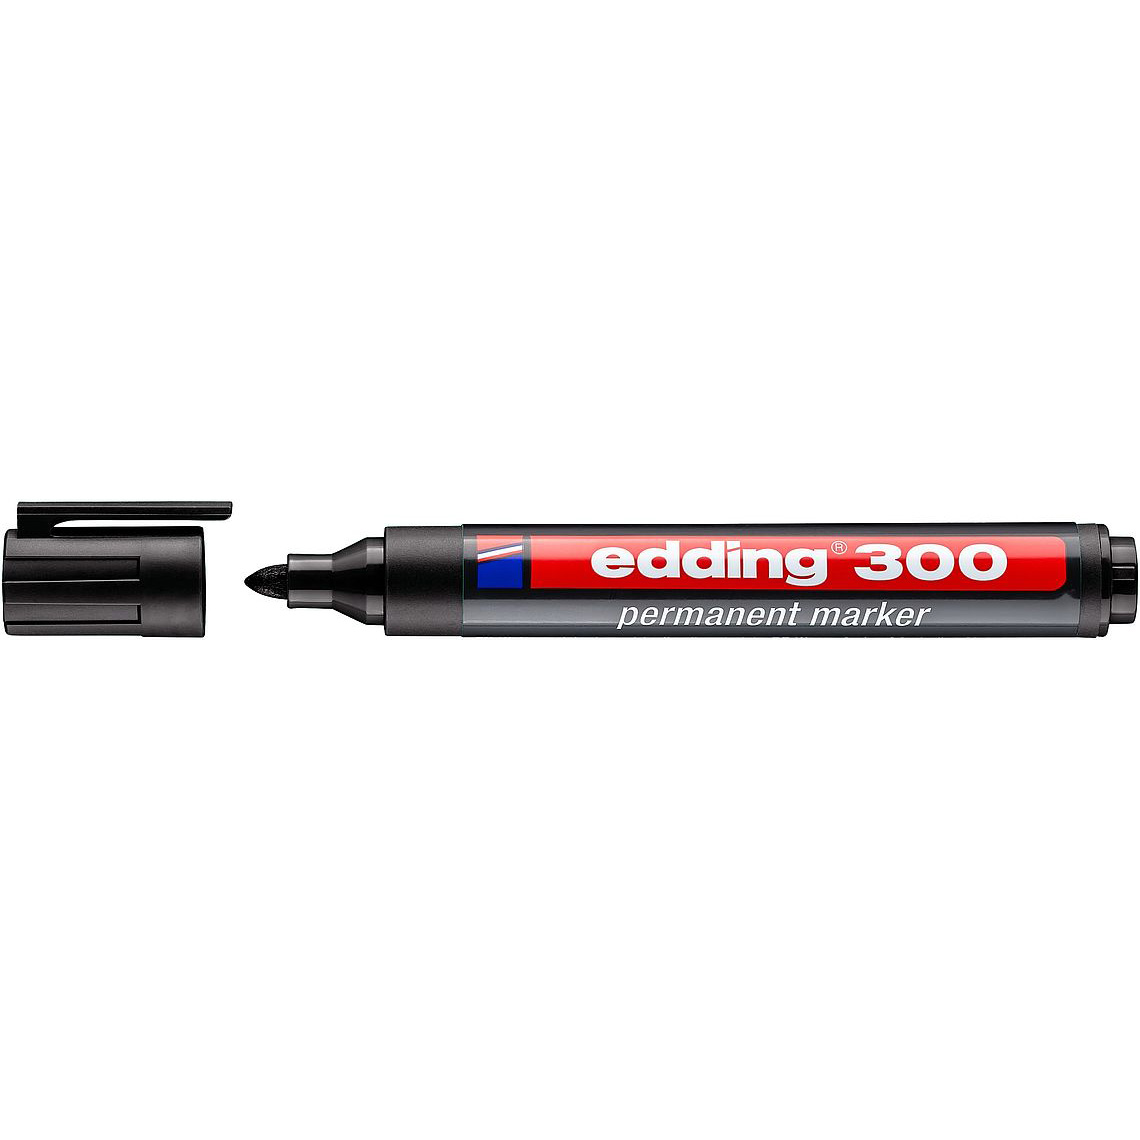 Edding 300 Permanent Marker Bullet Tip - Black (pc)